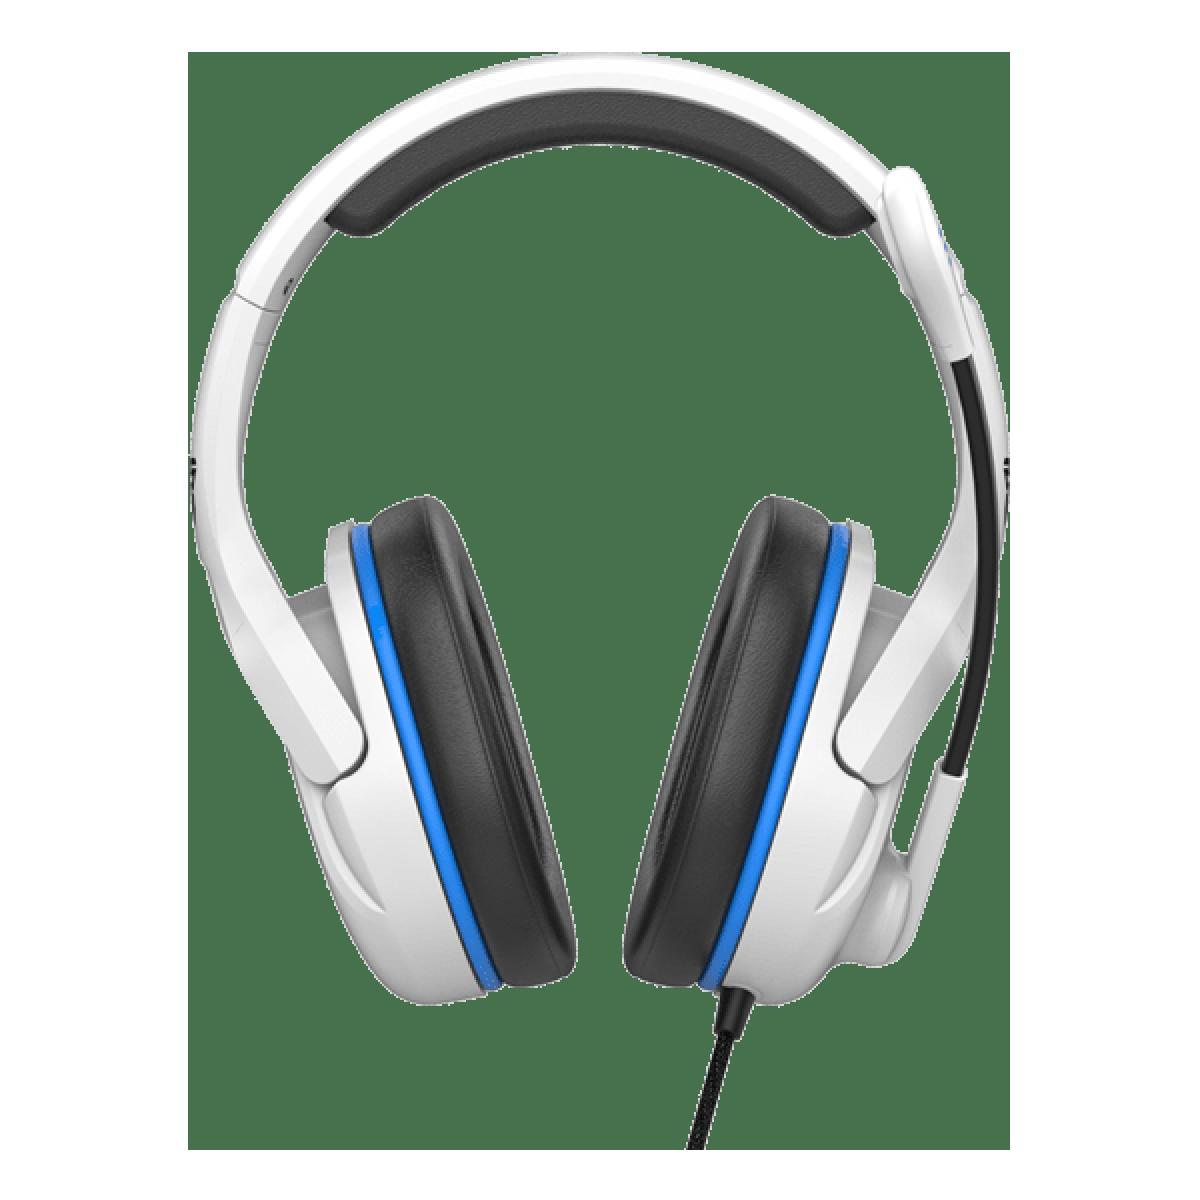 Headset Gamer Fantech Valor Space Edition, 3.5mm + USB, White/Blue, MH86